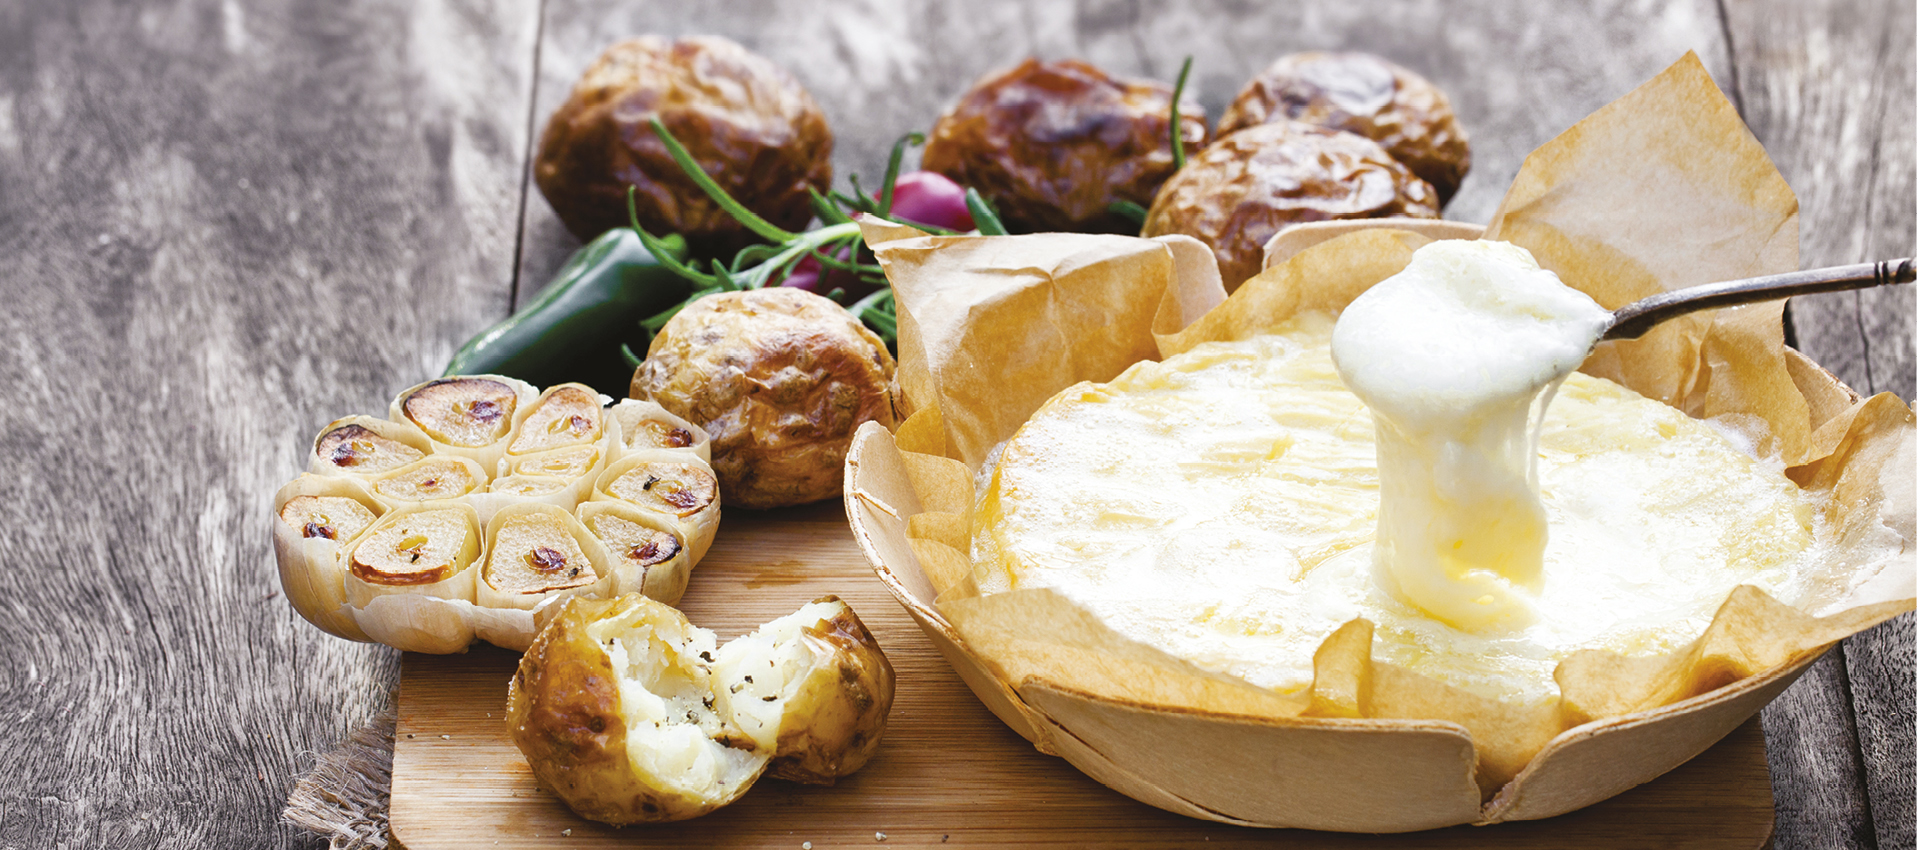 Pečeni camembert s krumpirom i češnjakom.jpg